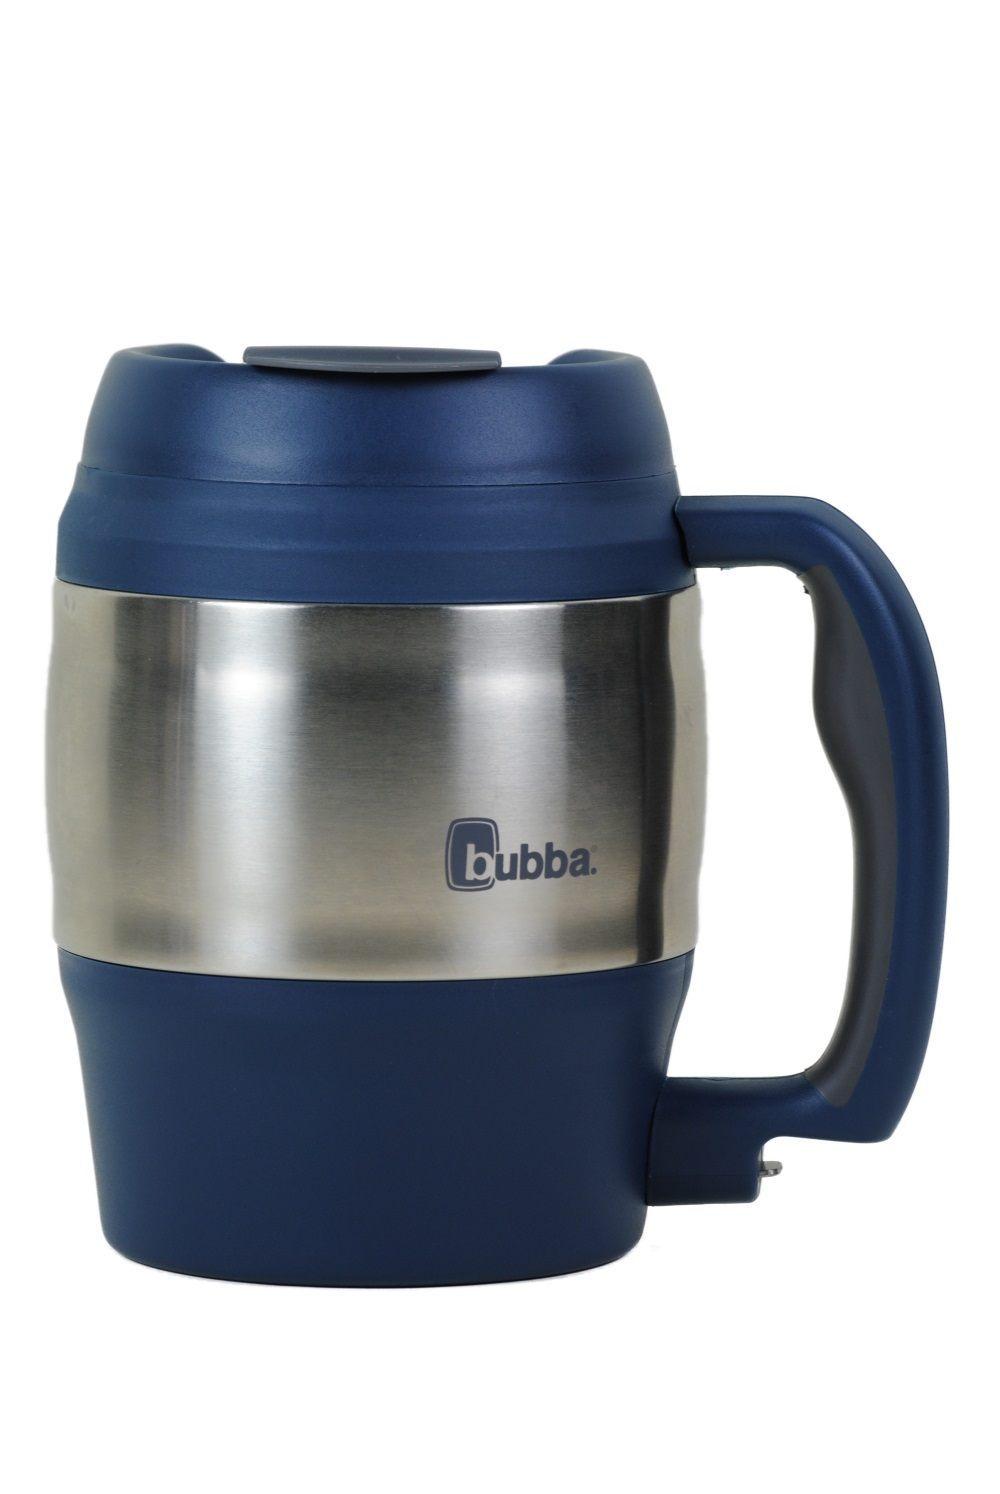 Bubba Brands 52 Oz Keg Mug Classic Navy Blue Ebay